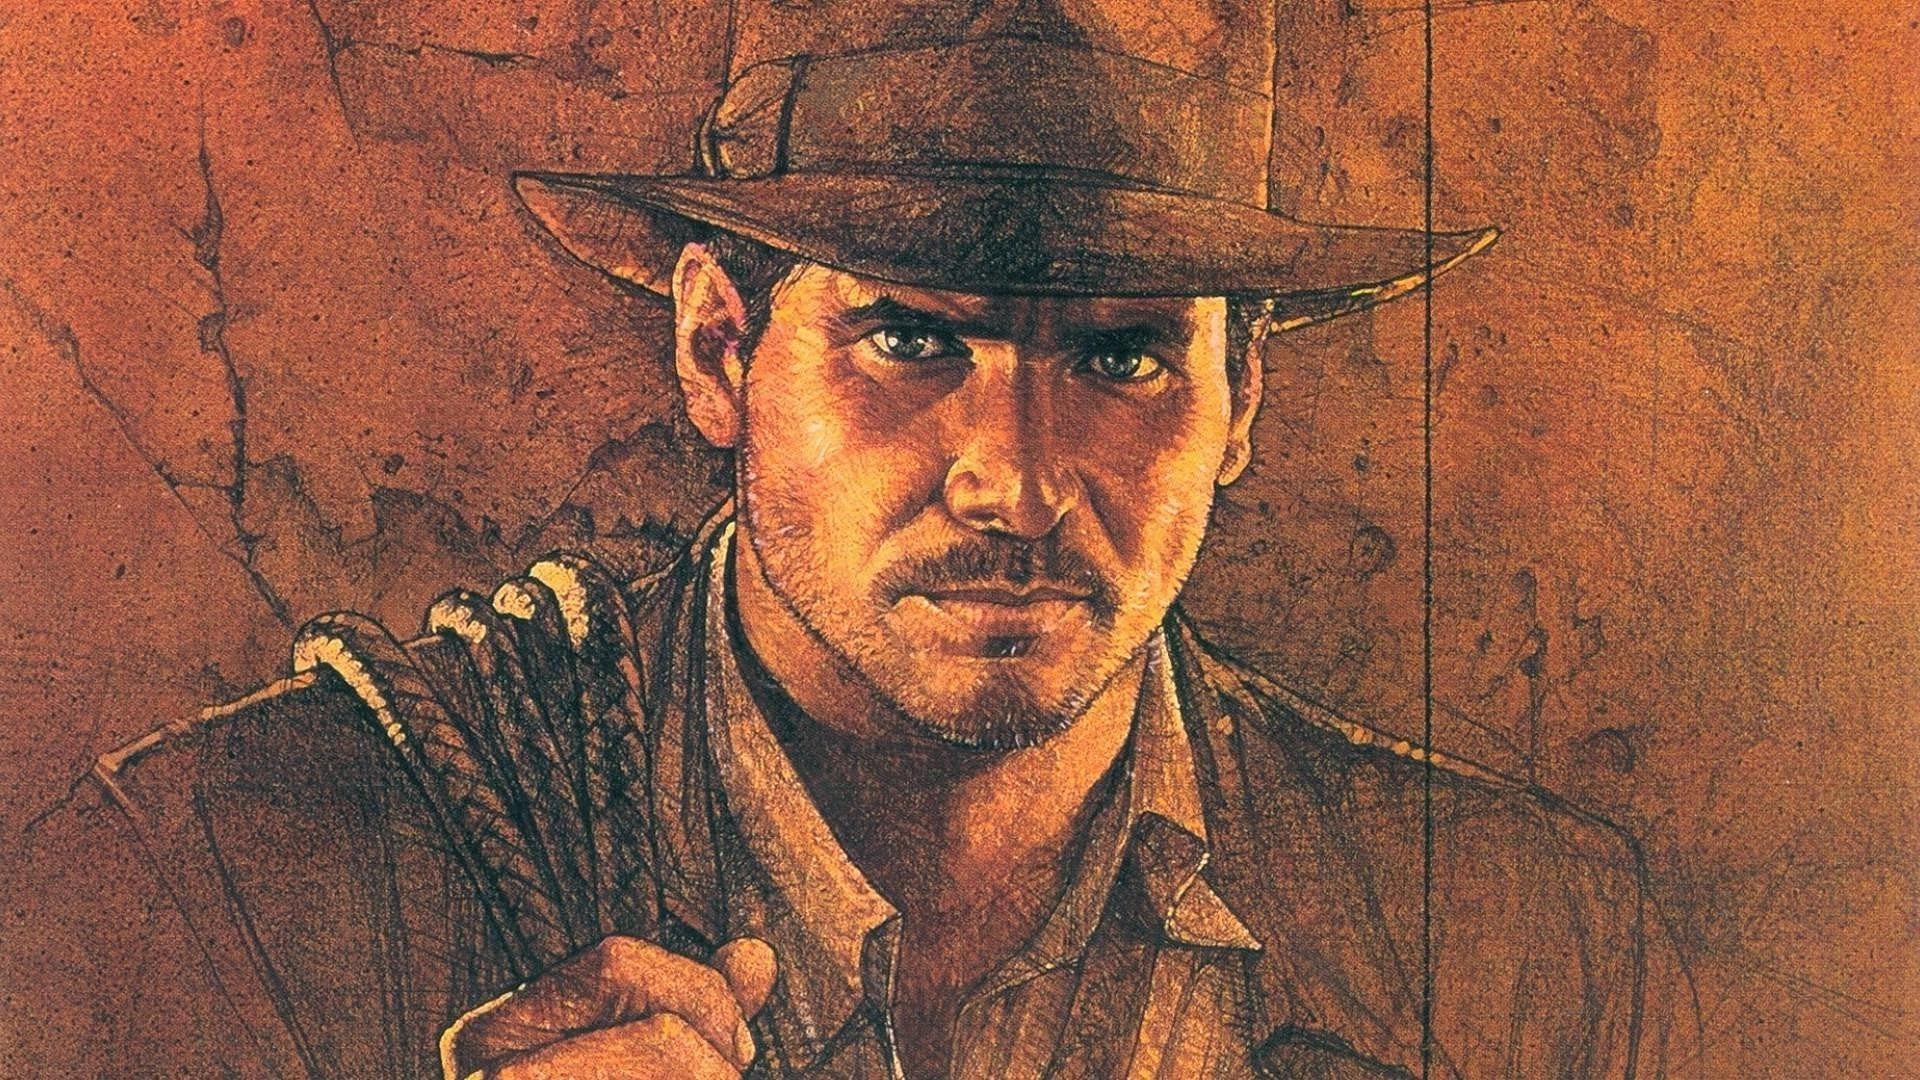 Indiana Jones Backgrounds, Compatible - PC, Mobile, Gadgets  1920x1080 px